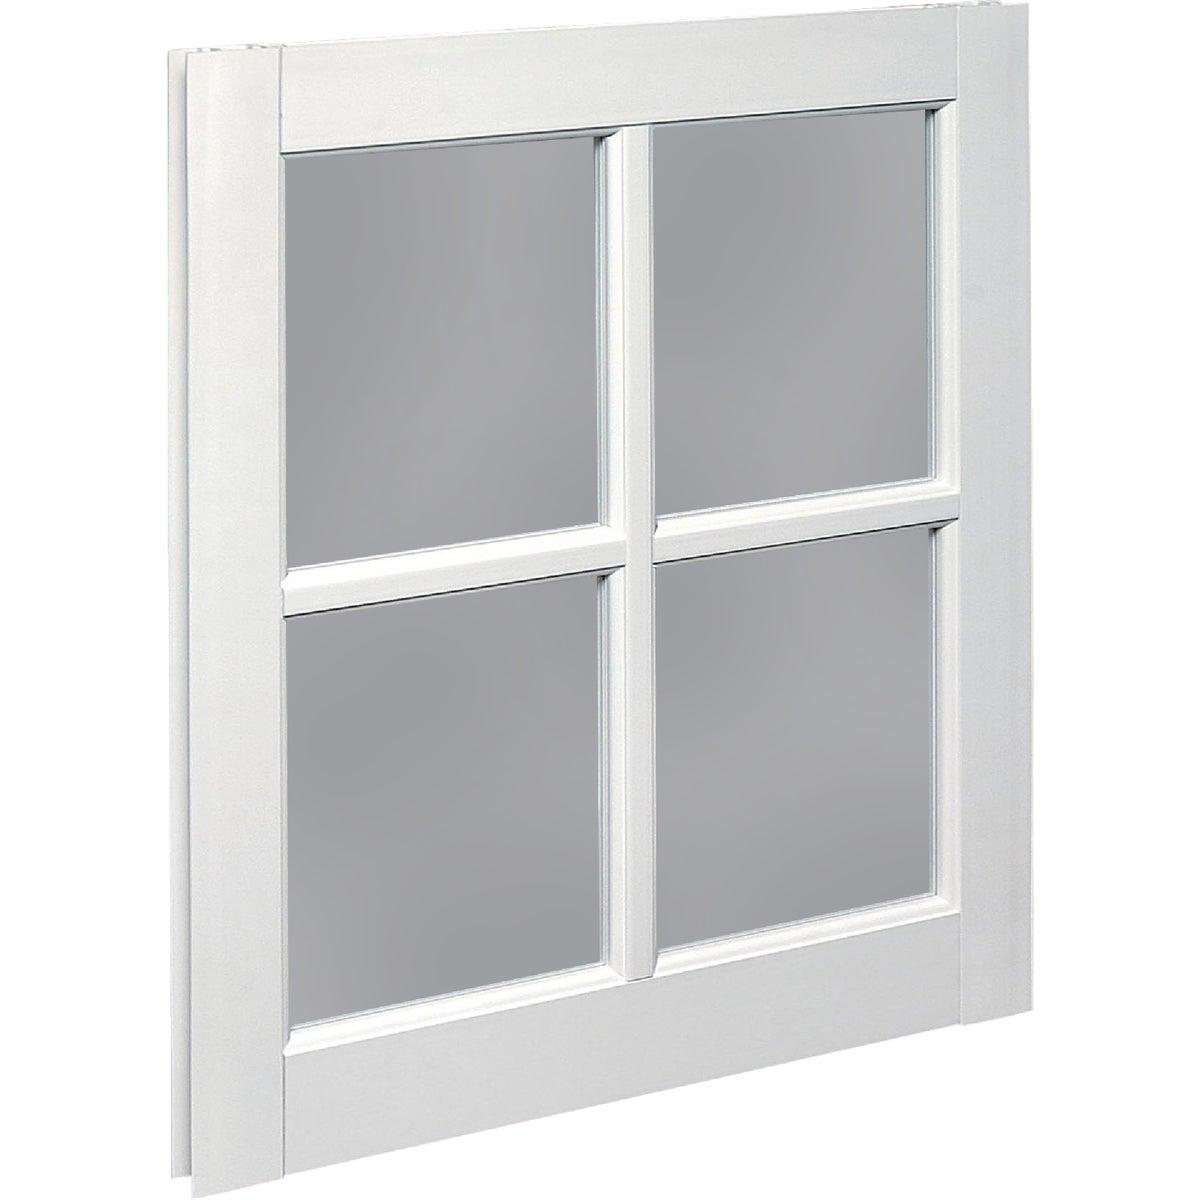 22X29 WHT PVC BARN SASH - BS2229W by Northview Window